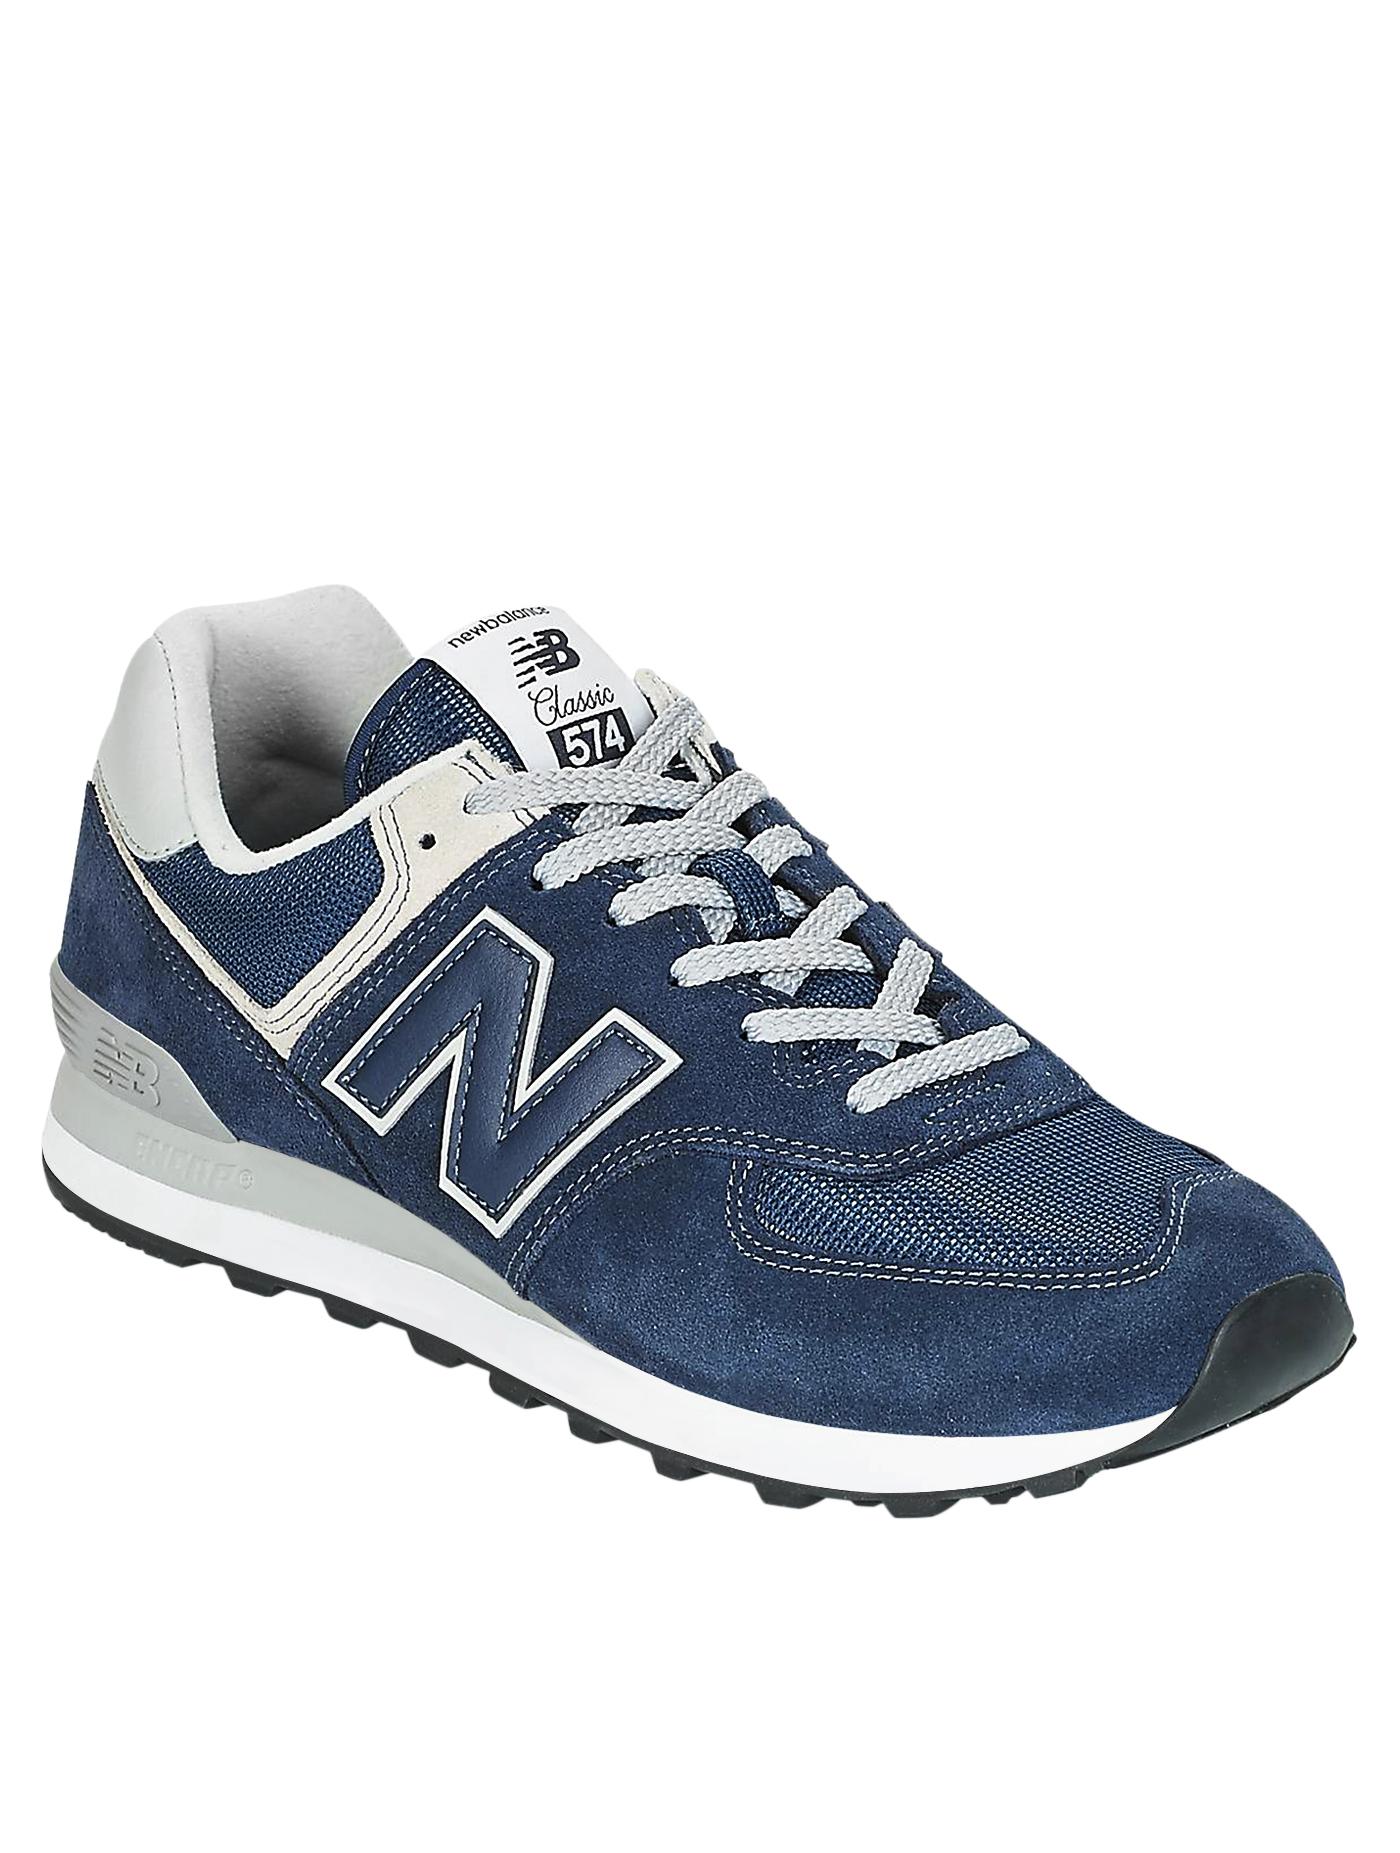 quality design cb515 4ad7b NEW BALANCE รองเท้าลำลองผู้ชาย รุ่น 574 Classics ML574 ...